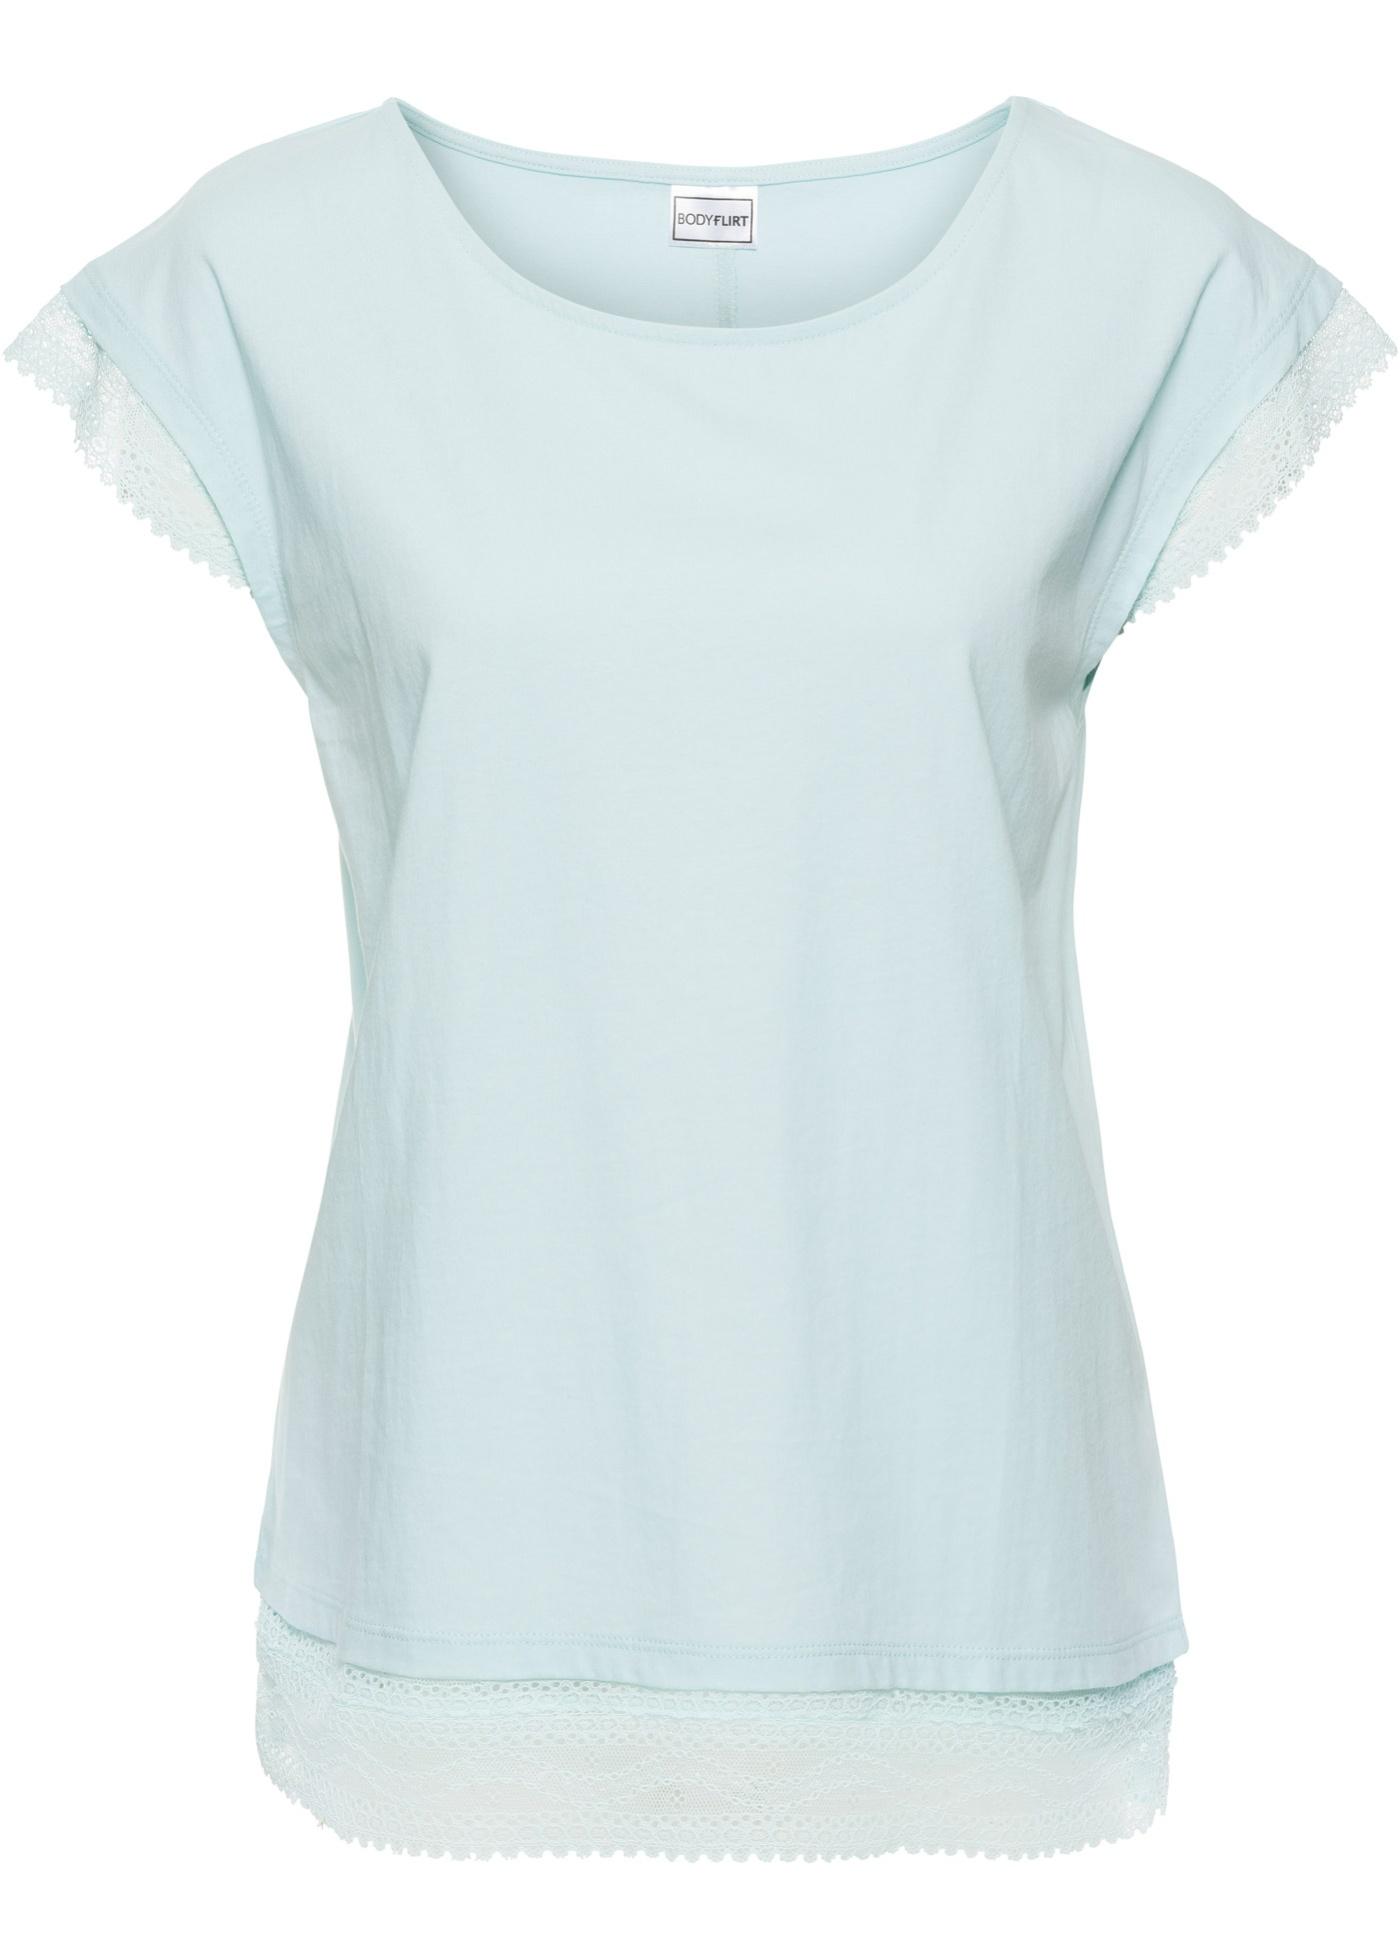 shirt Pour BonprixT Bleu Manches Dentelle Courtes Avec Femme Bodyflirt Boxy WHYE2D9I